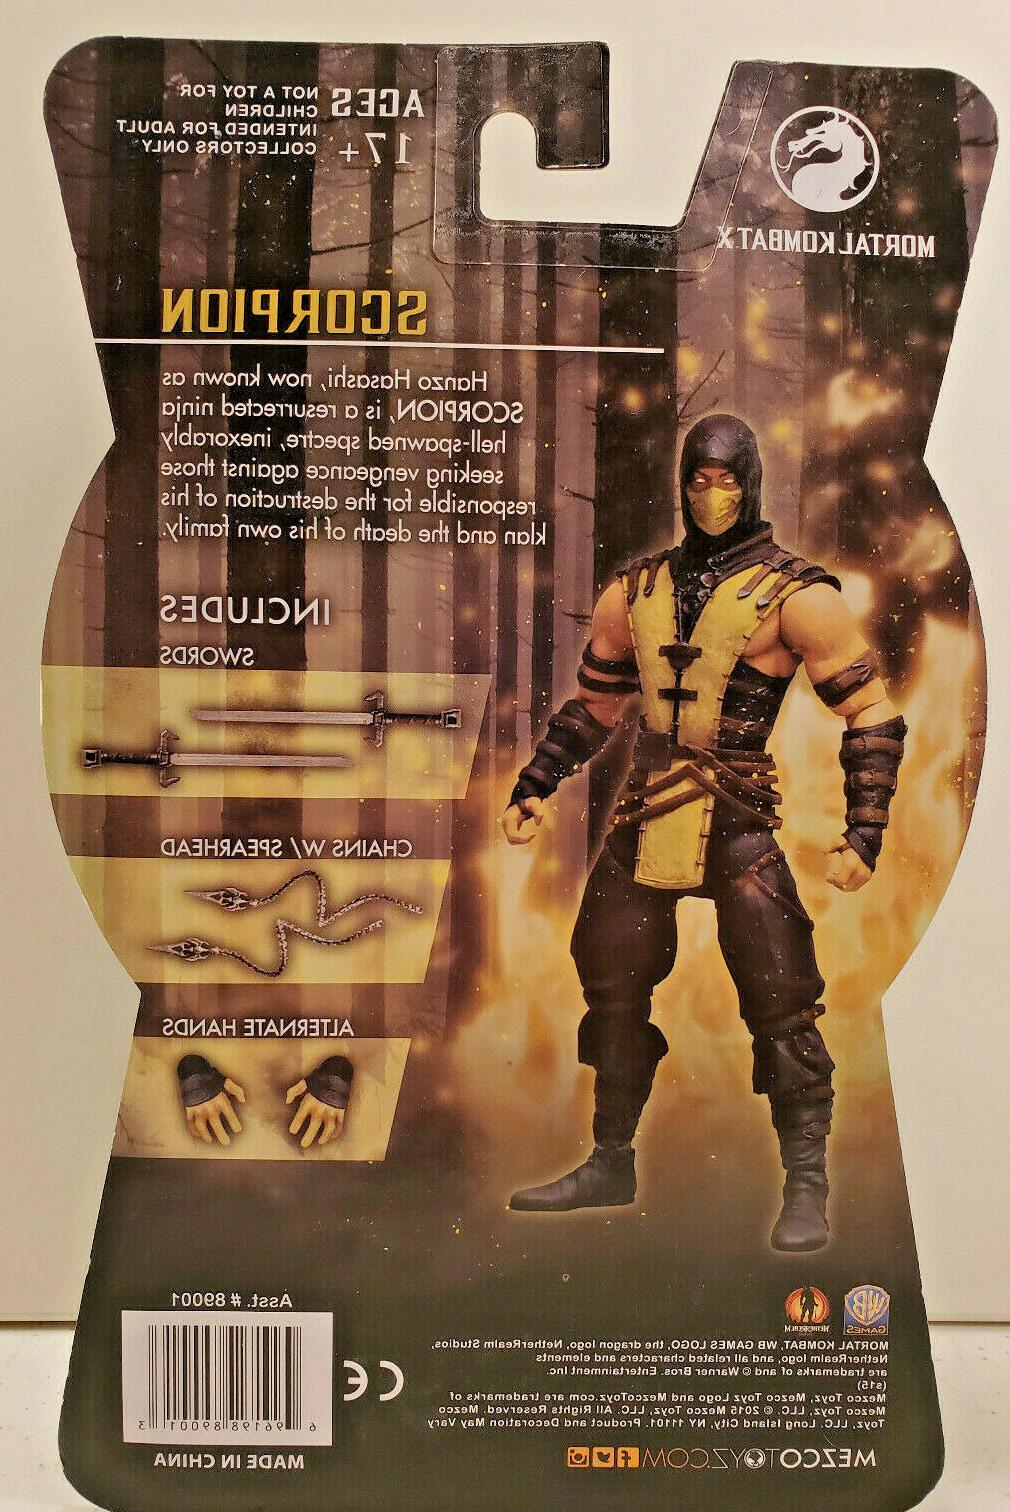 Mezco, Scorpion Action